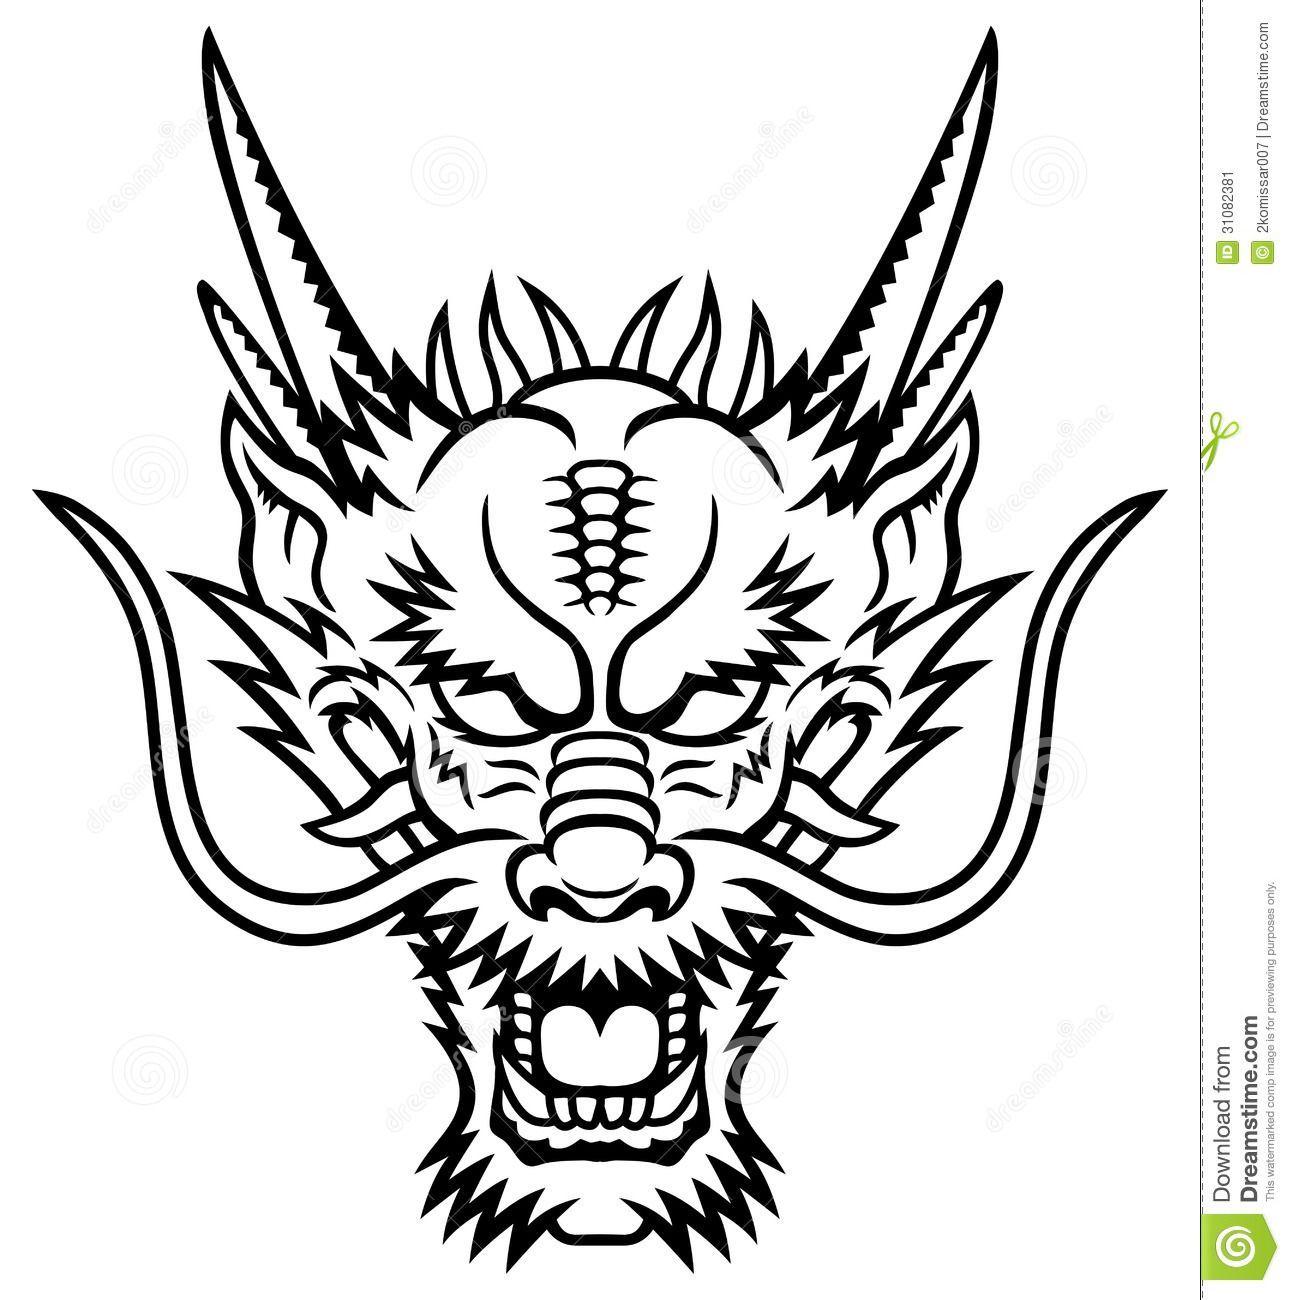 Cabezas De Dragones Para Tatuar stock vector | tatuajes de dragón chino, dibujo de cabeza de